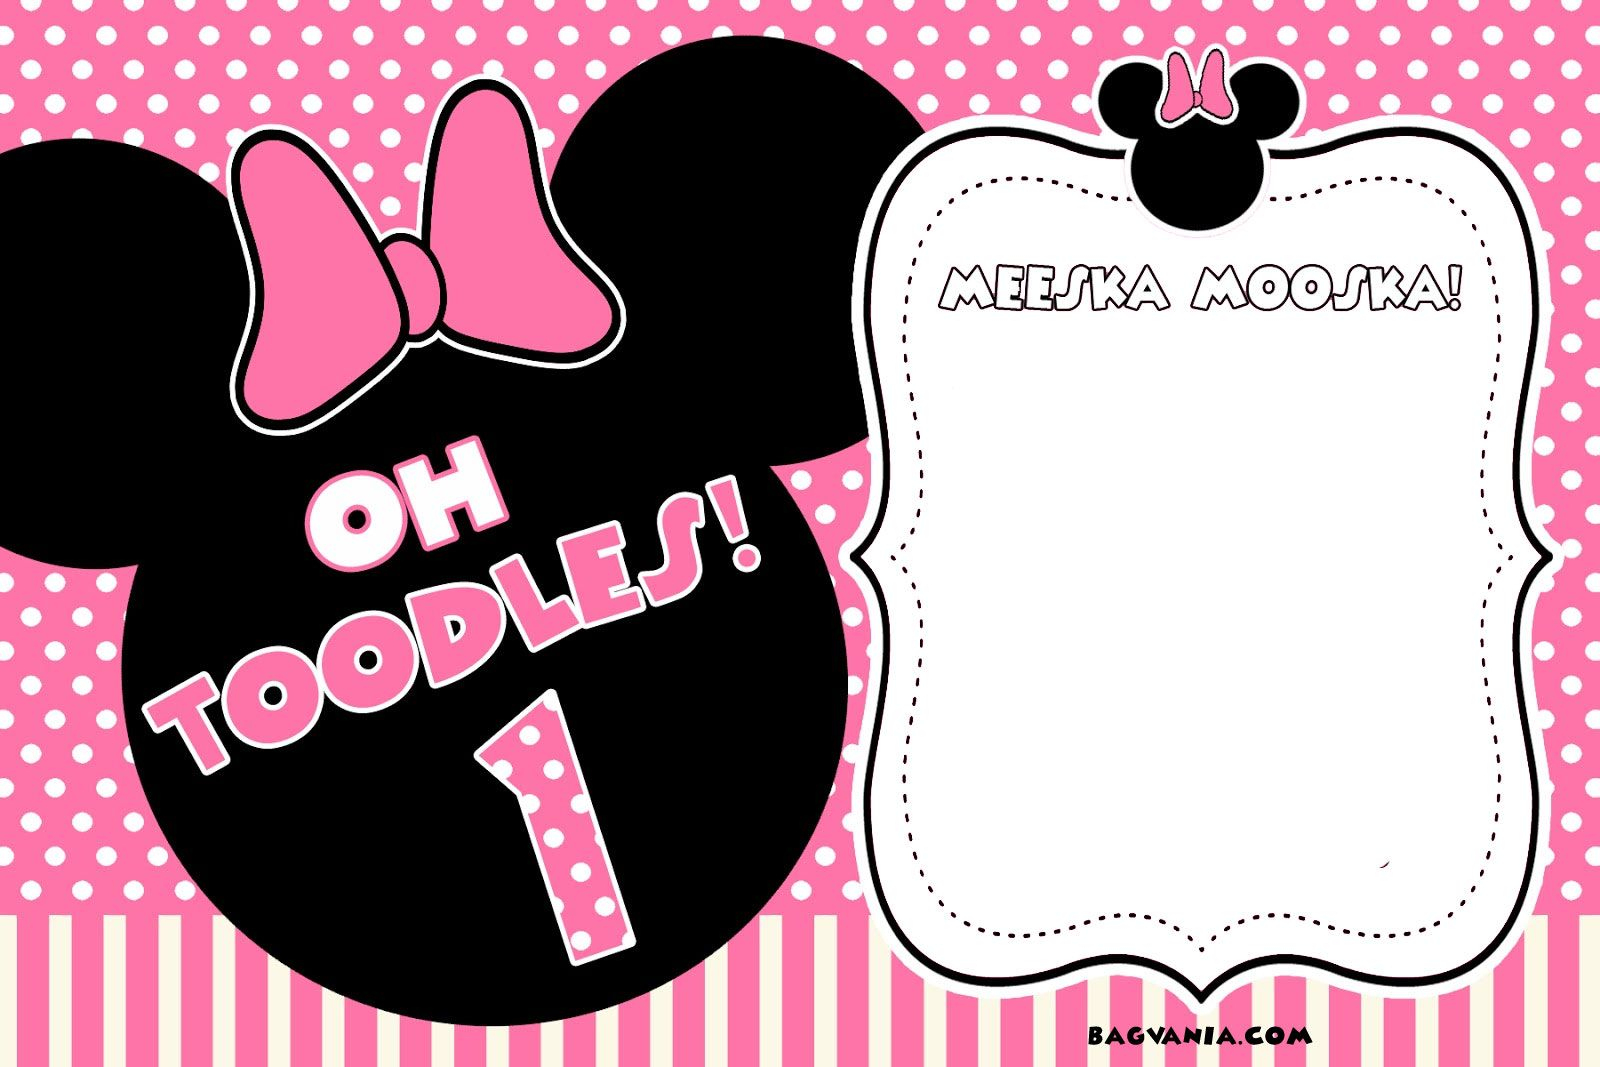 Free Free Printable Minnie Mouse Birthday Invitations | Bagvania - Free Printable Minnie Mouse Party Invitations